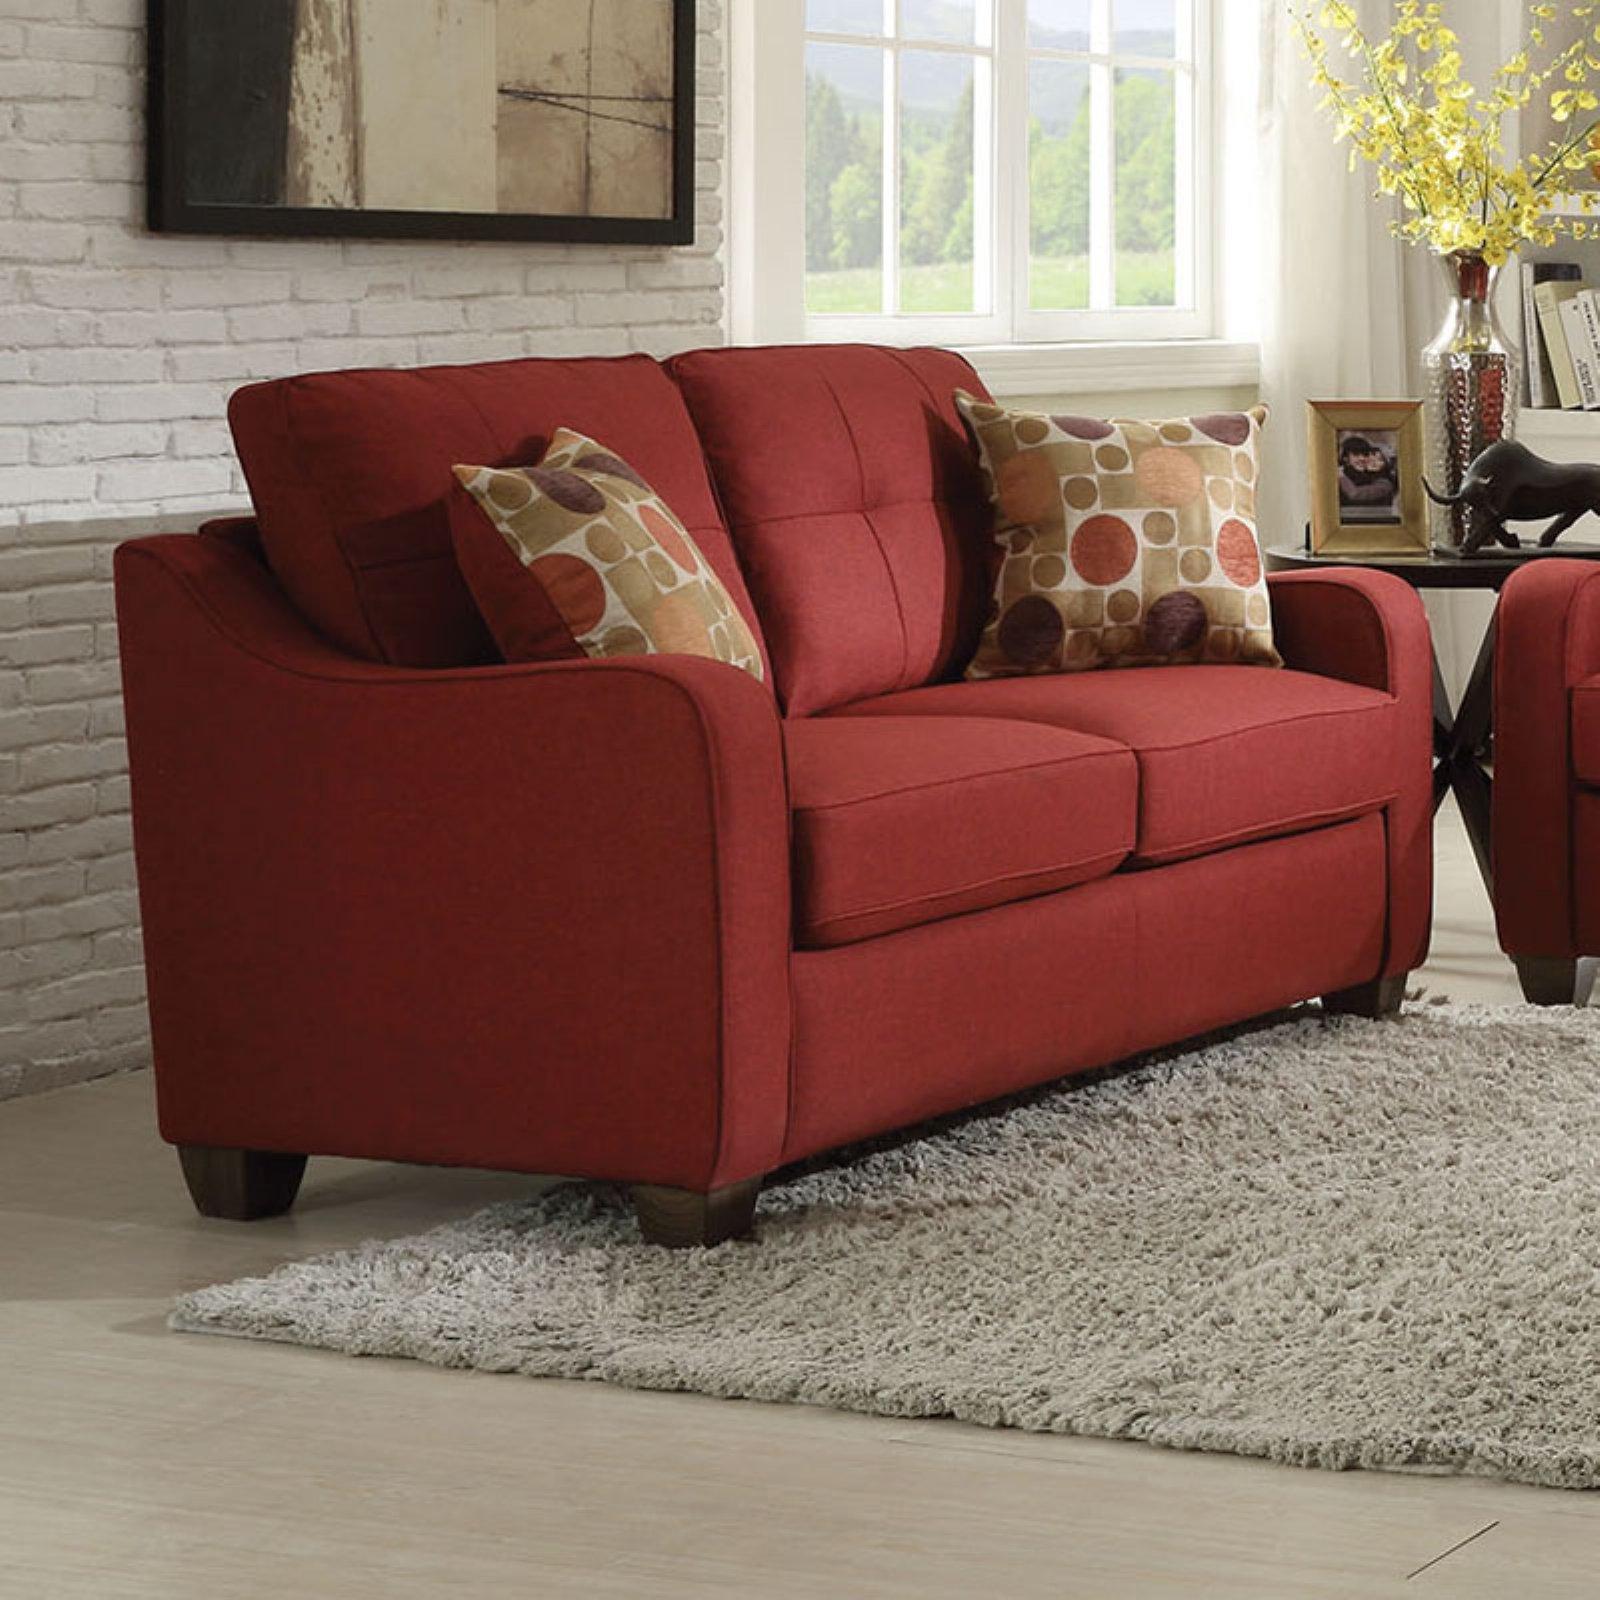 Acme Cleavon Ii Loveseat With 2 Pillows Red Linen Walmartcom